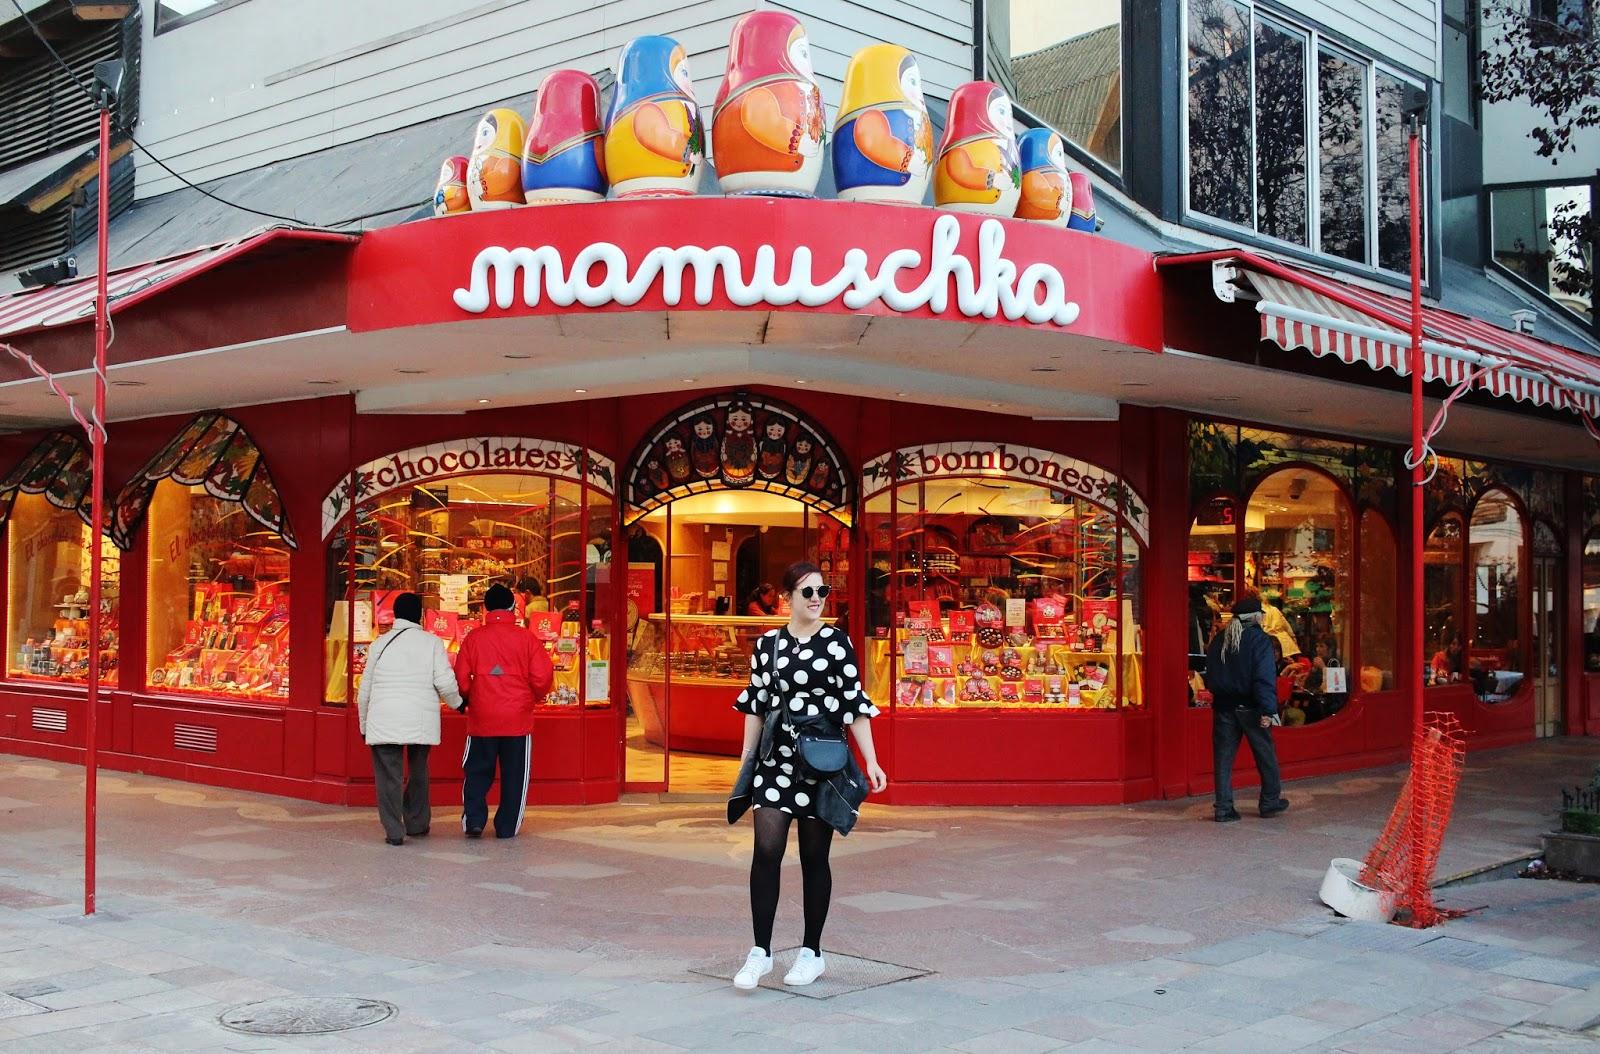 MAMUSCHKA